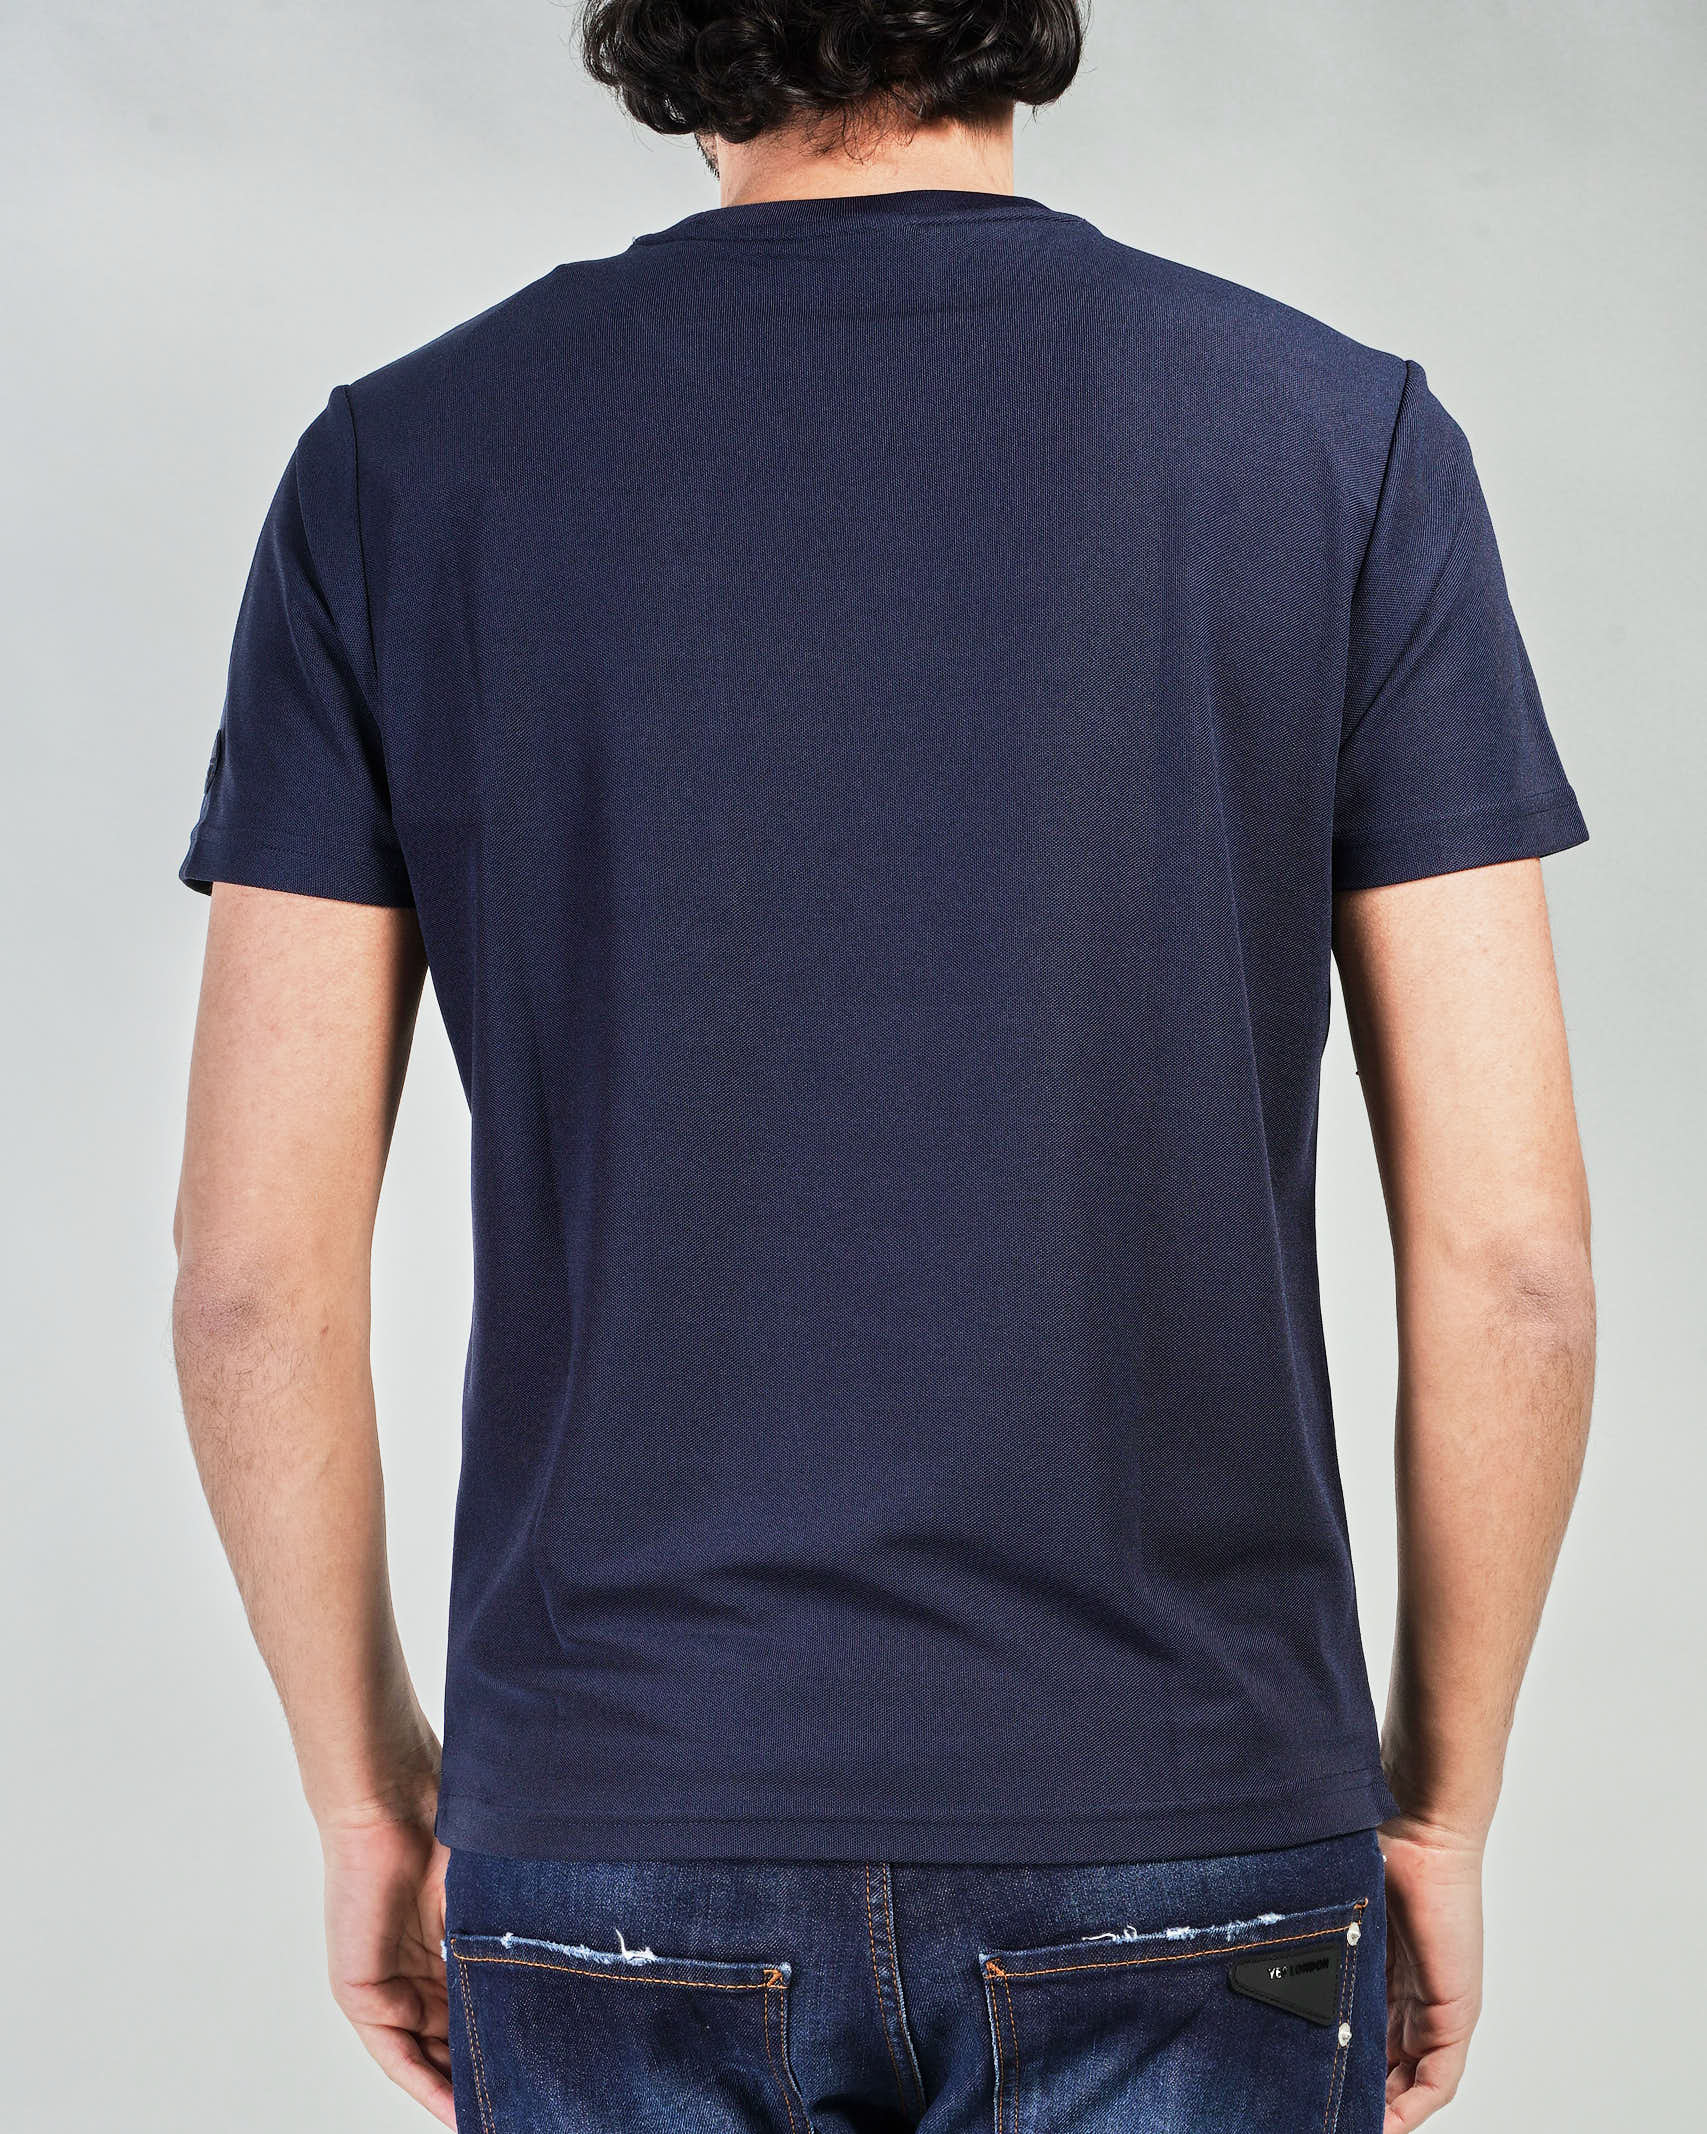 T-shirt con logo a contrasto North Sails X Prada NORTH SAILS X PRADA | T-shirt | 452309802